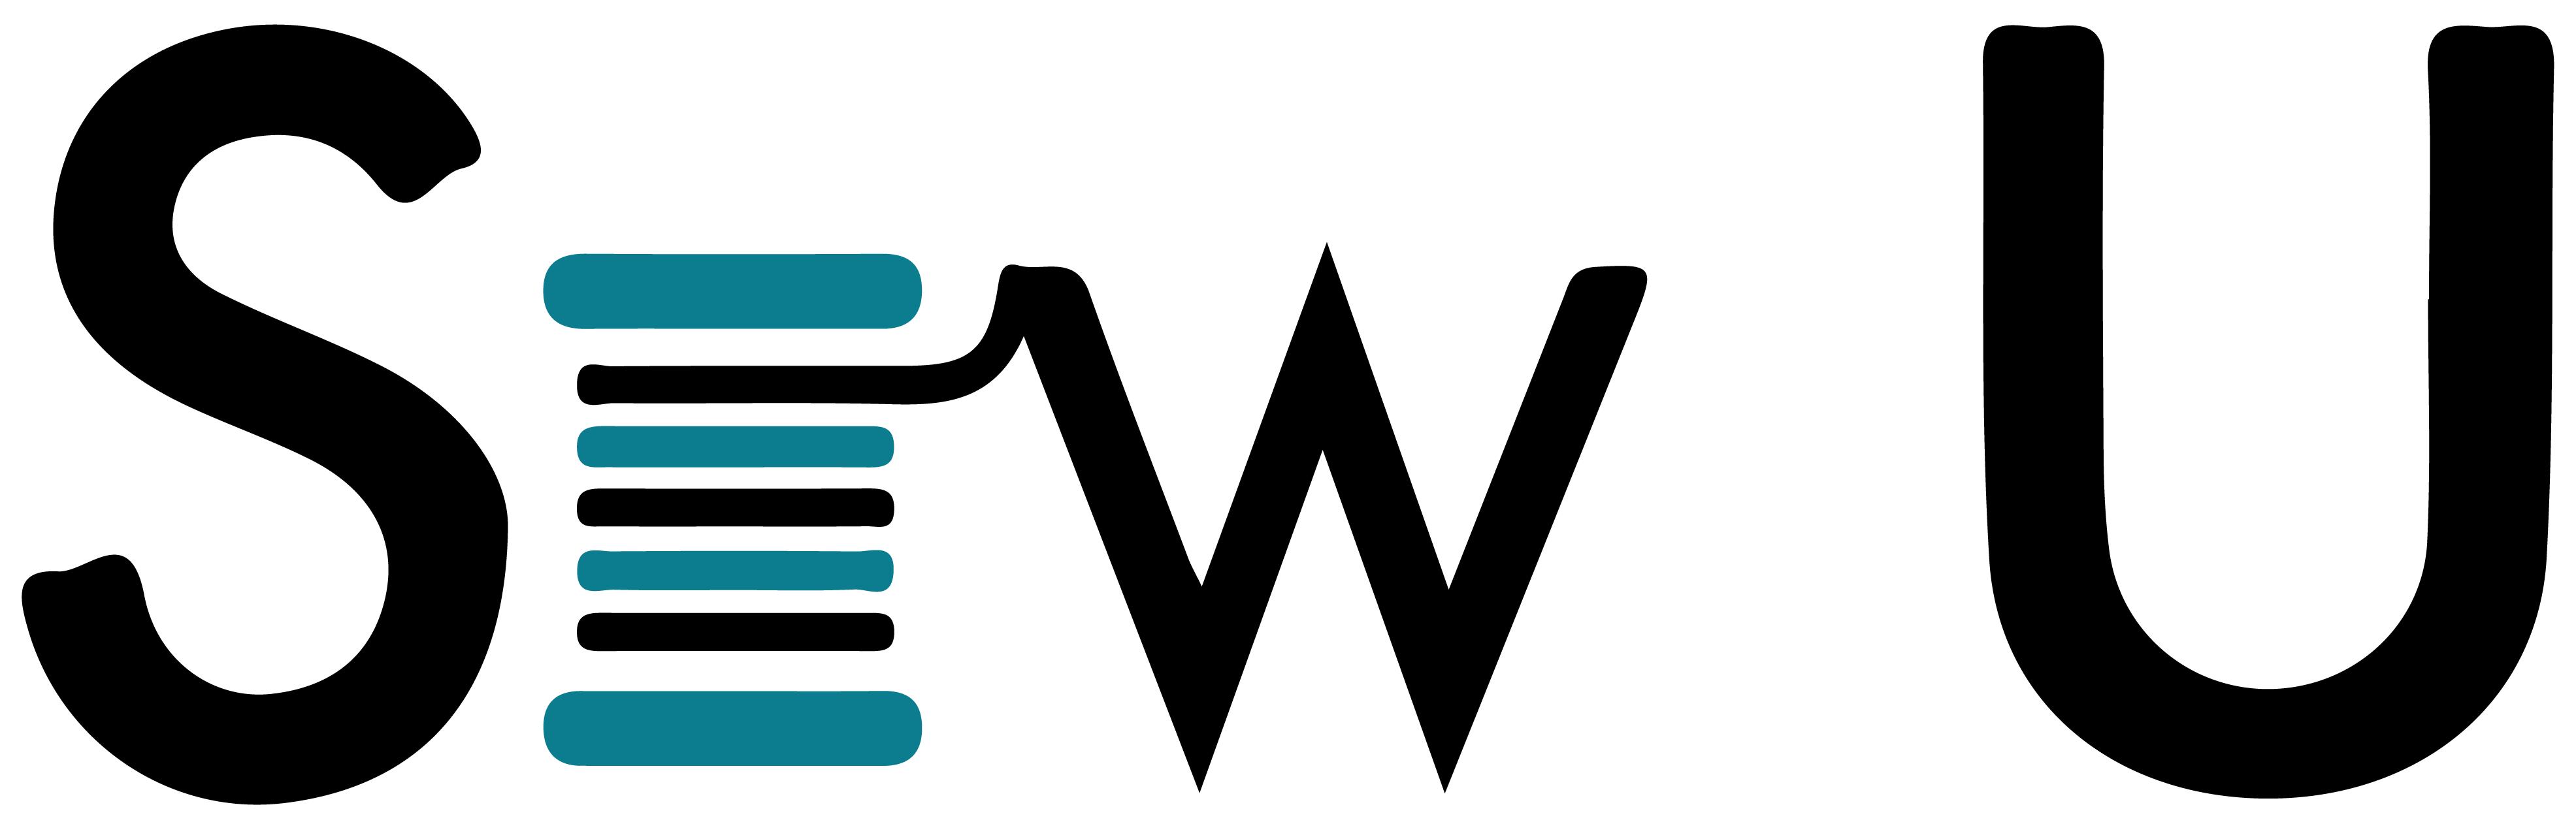 Mister Domestic's Sew U logo